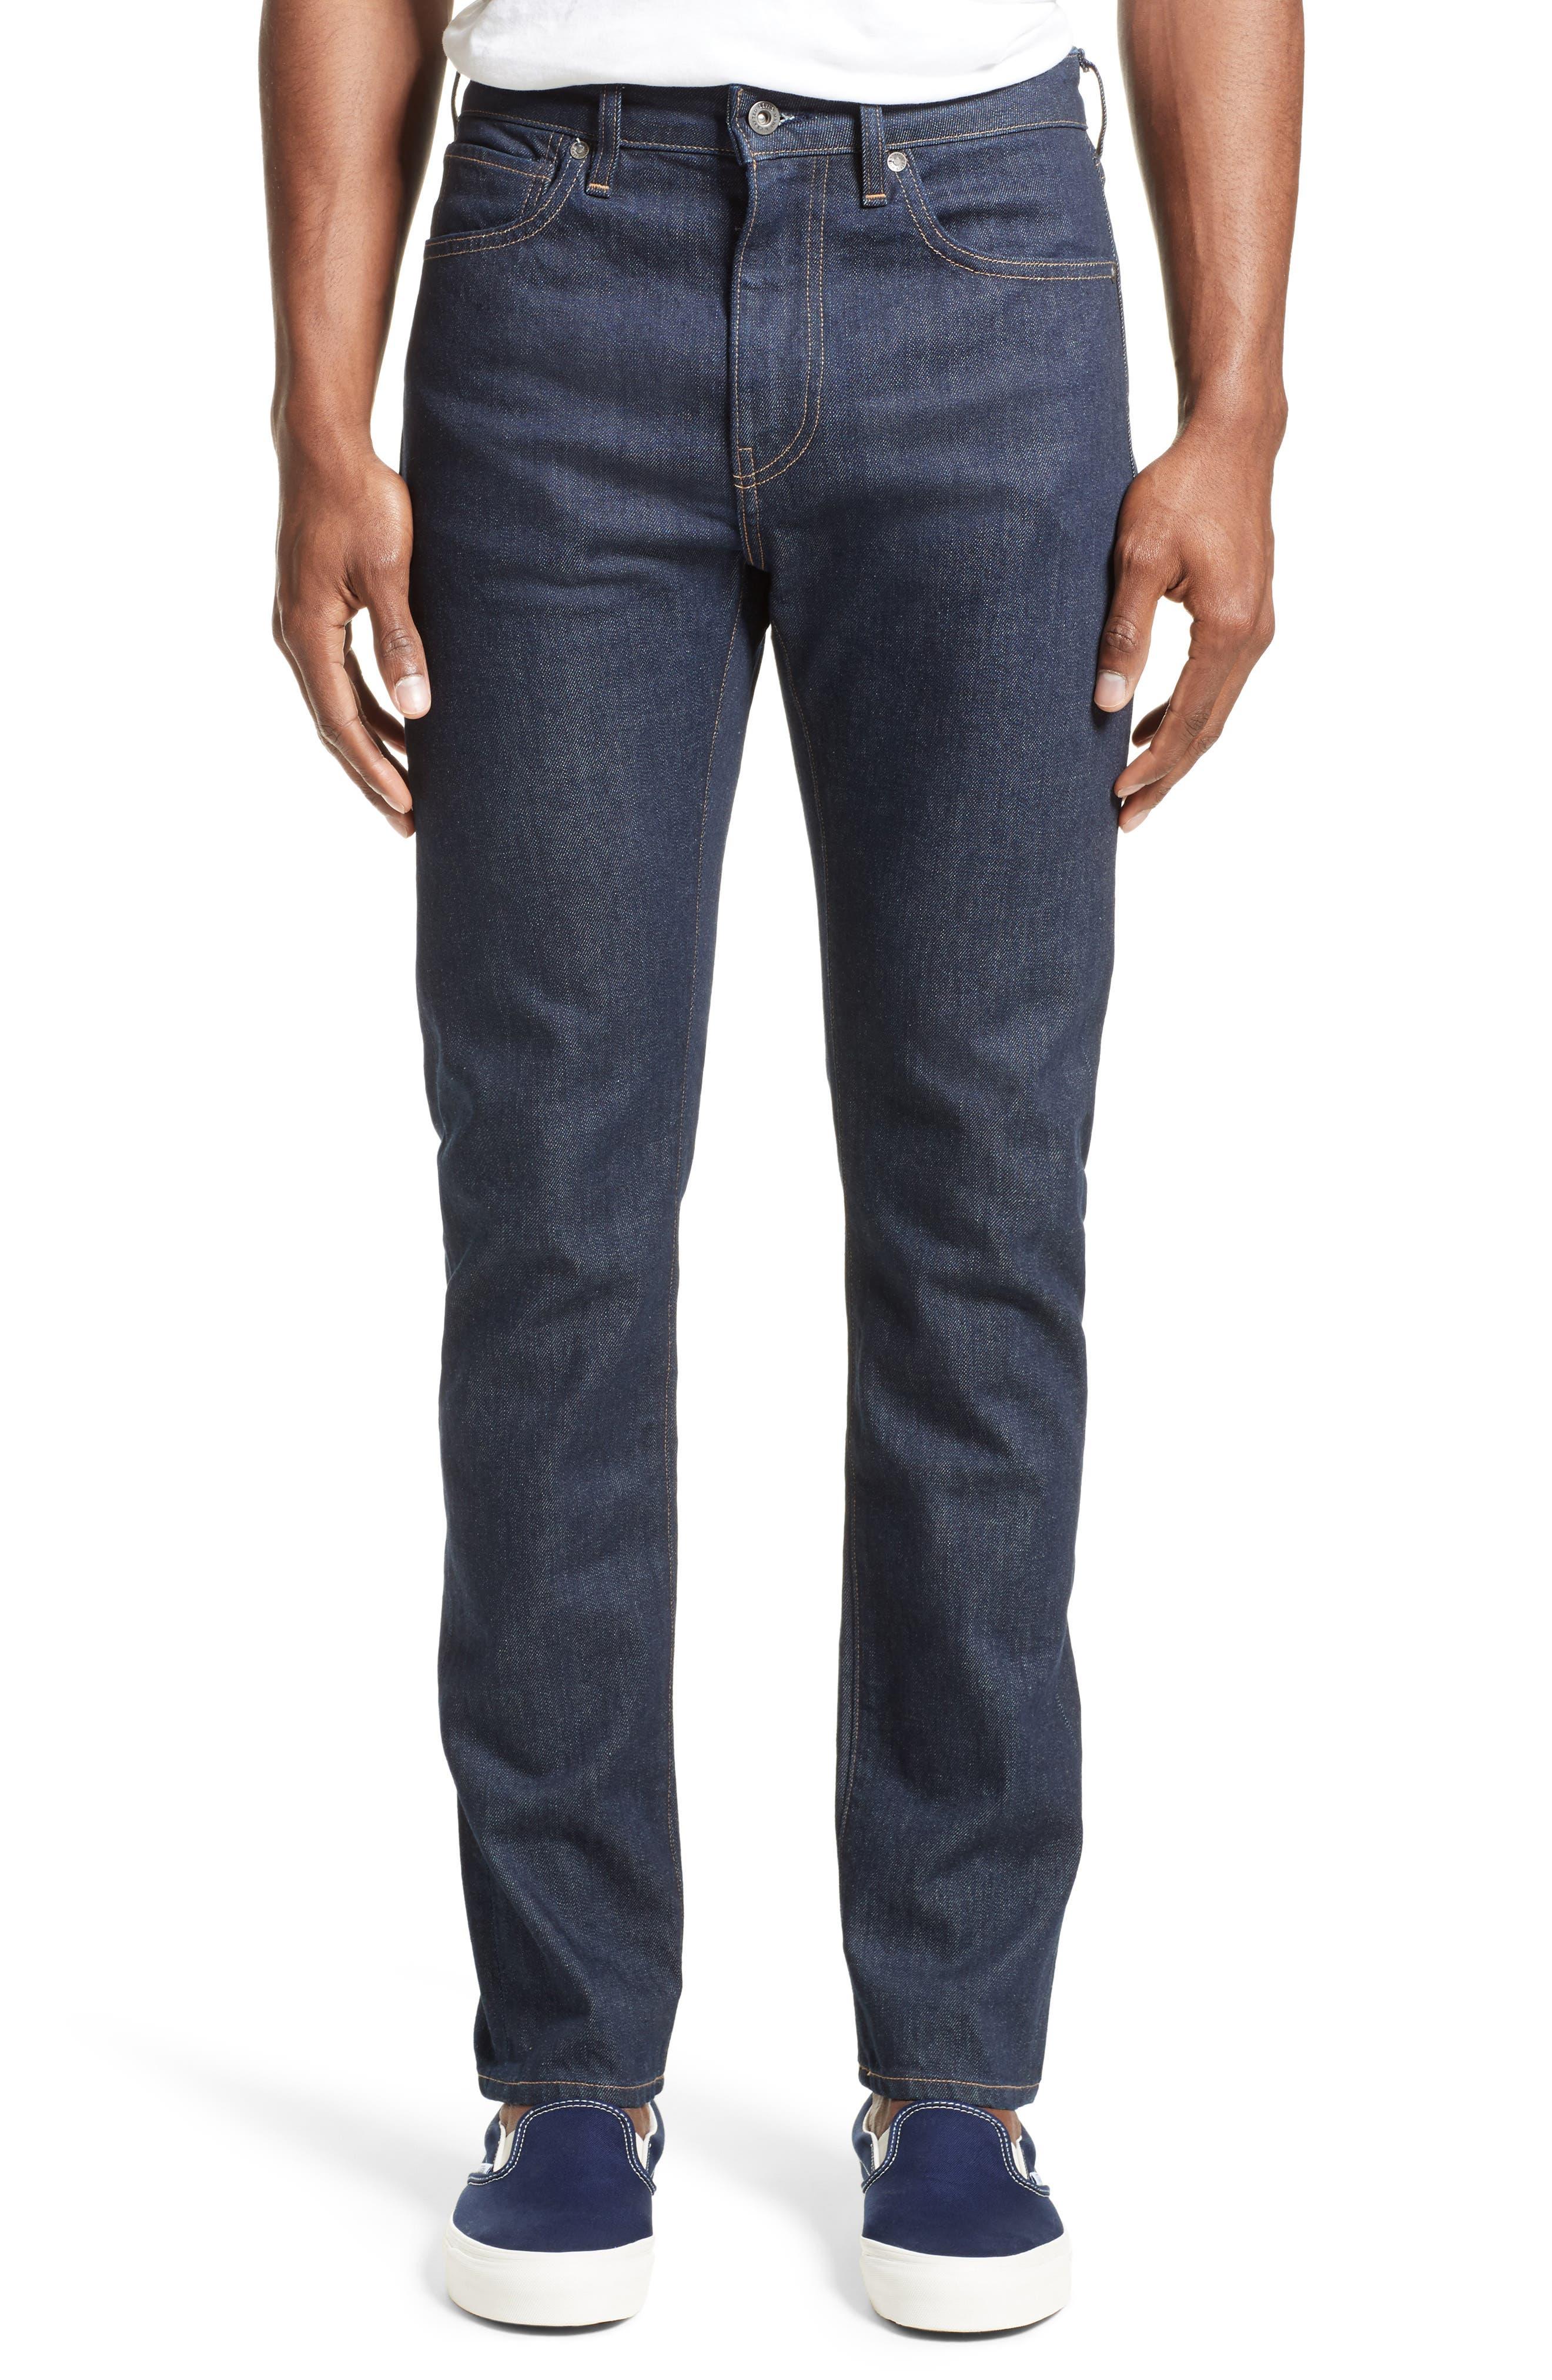 Tack Slim Fit Jeans,                         Main,                         color, Dark Blue